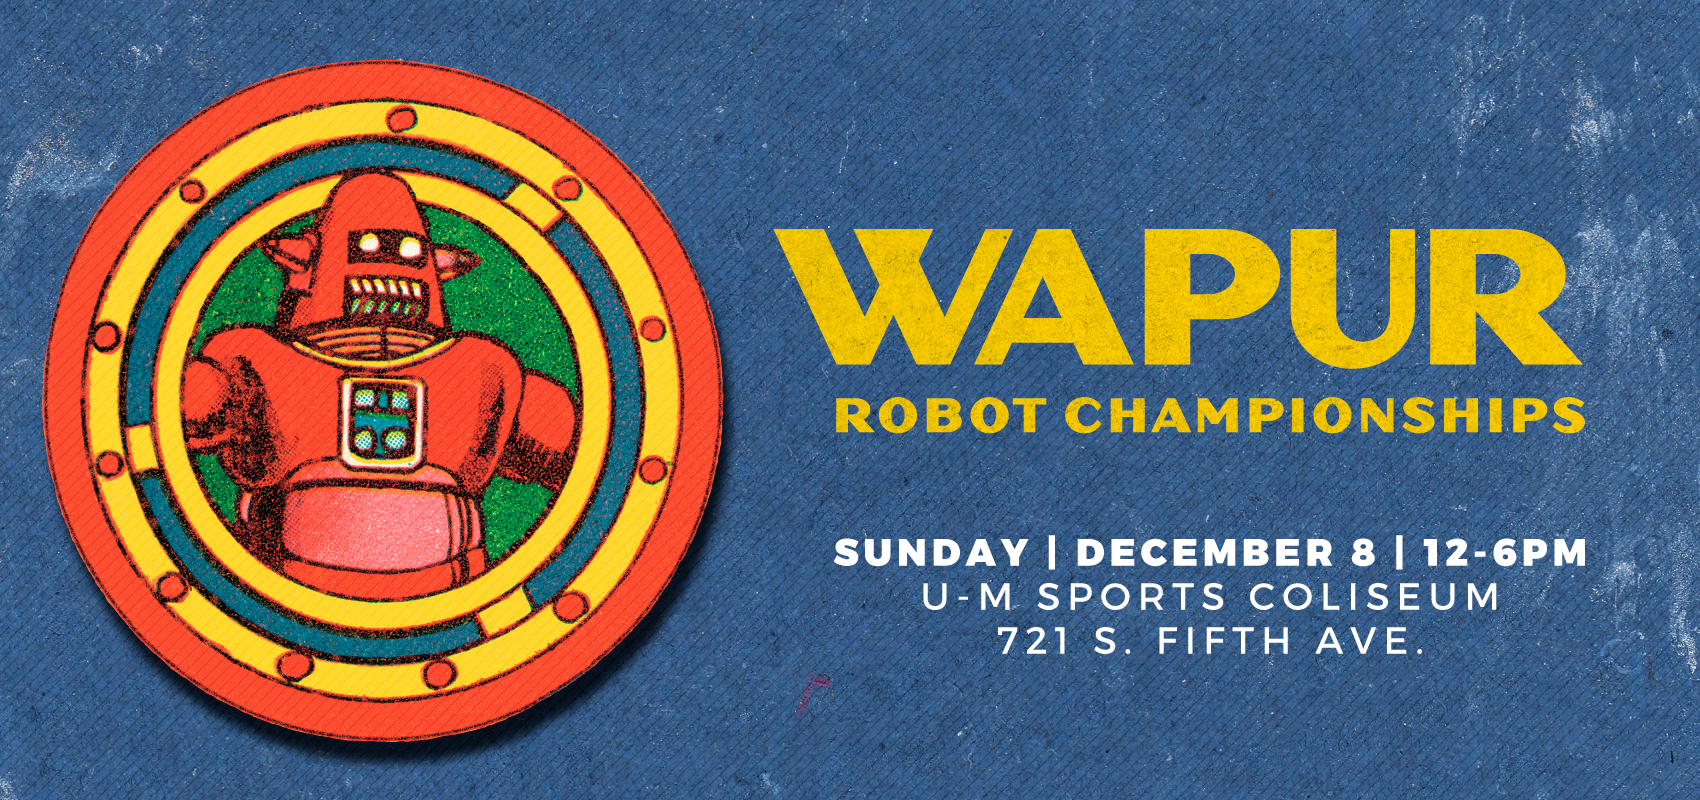 WAPUR High School Robotics Competition. .